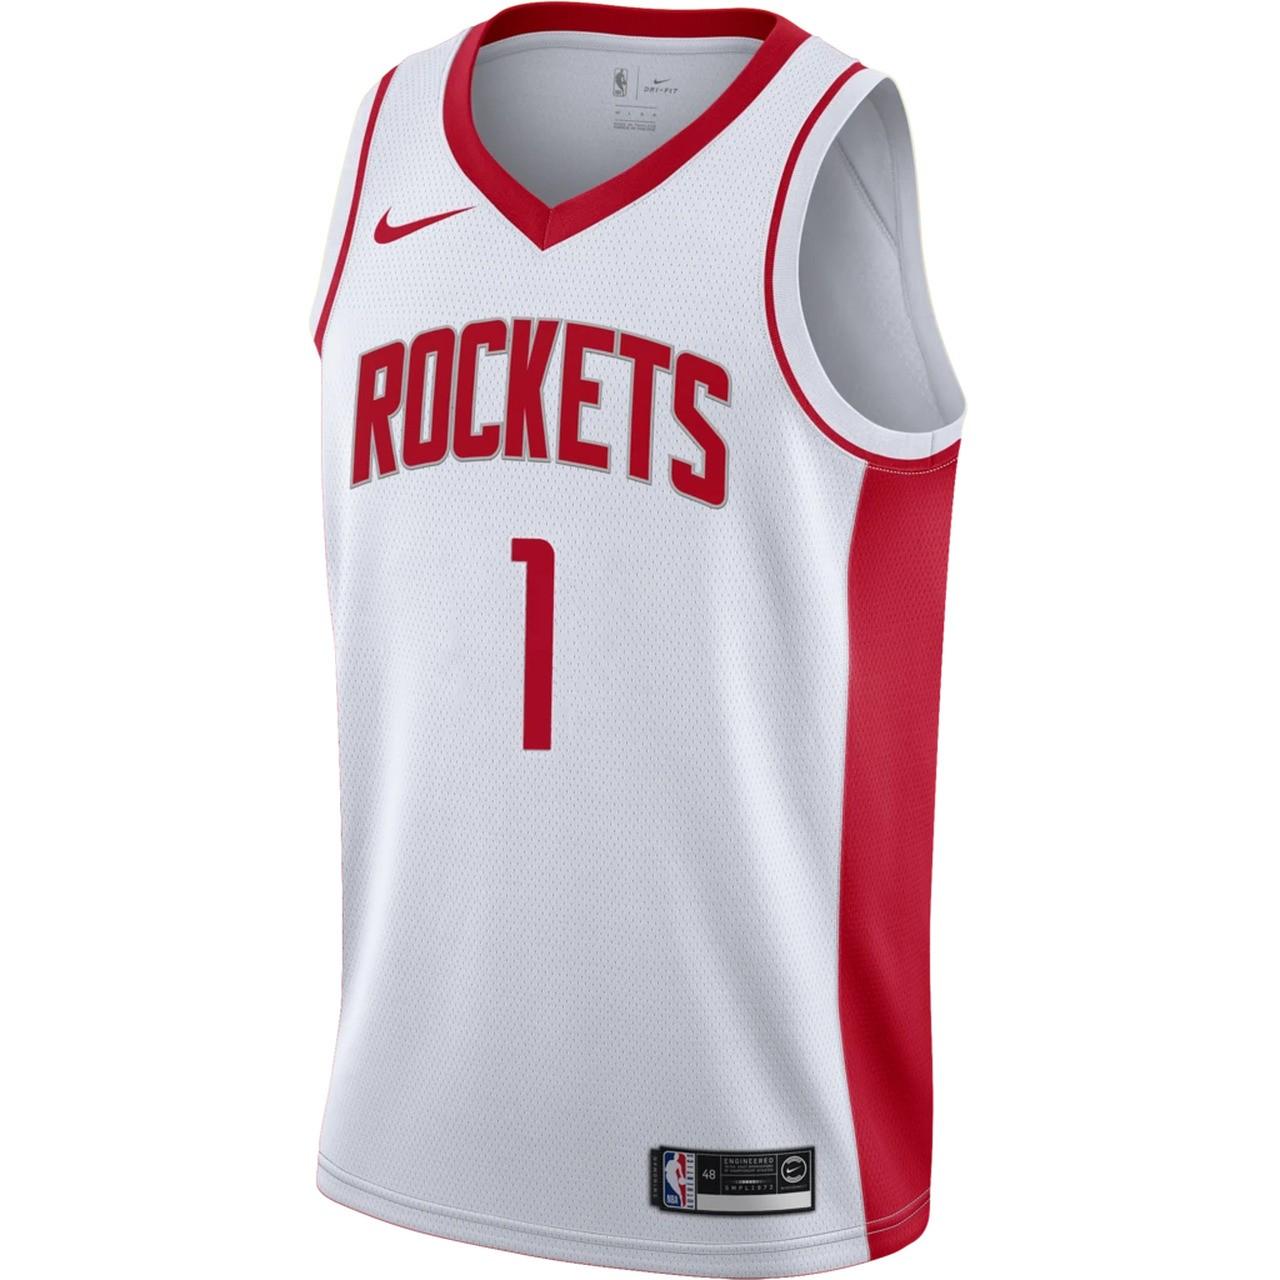 Regata Nike Houston Rockets Association Edition 2020/21 Swingman